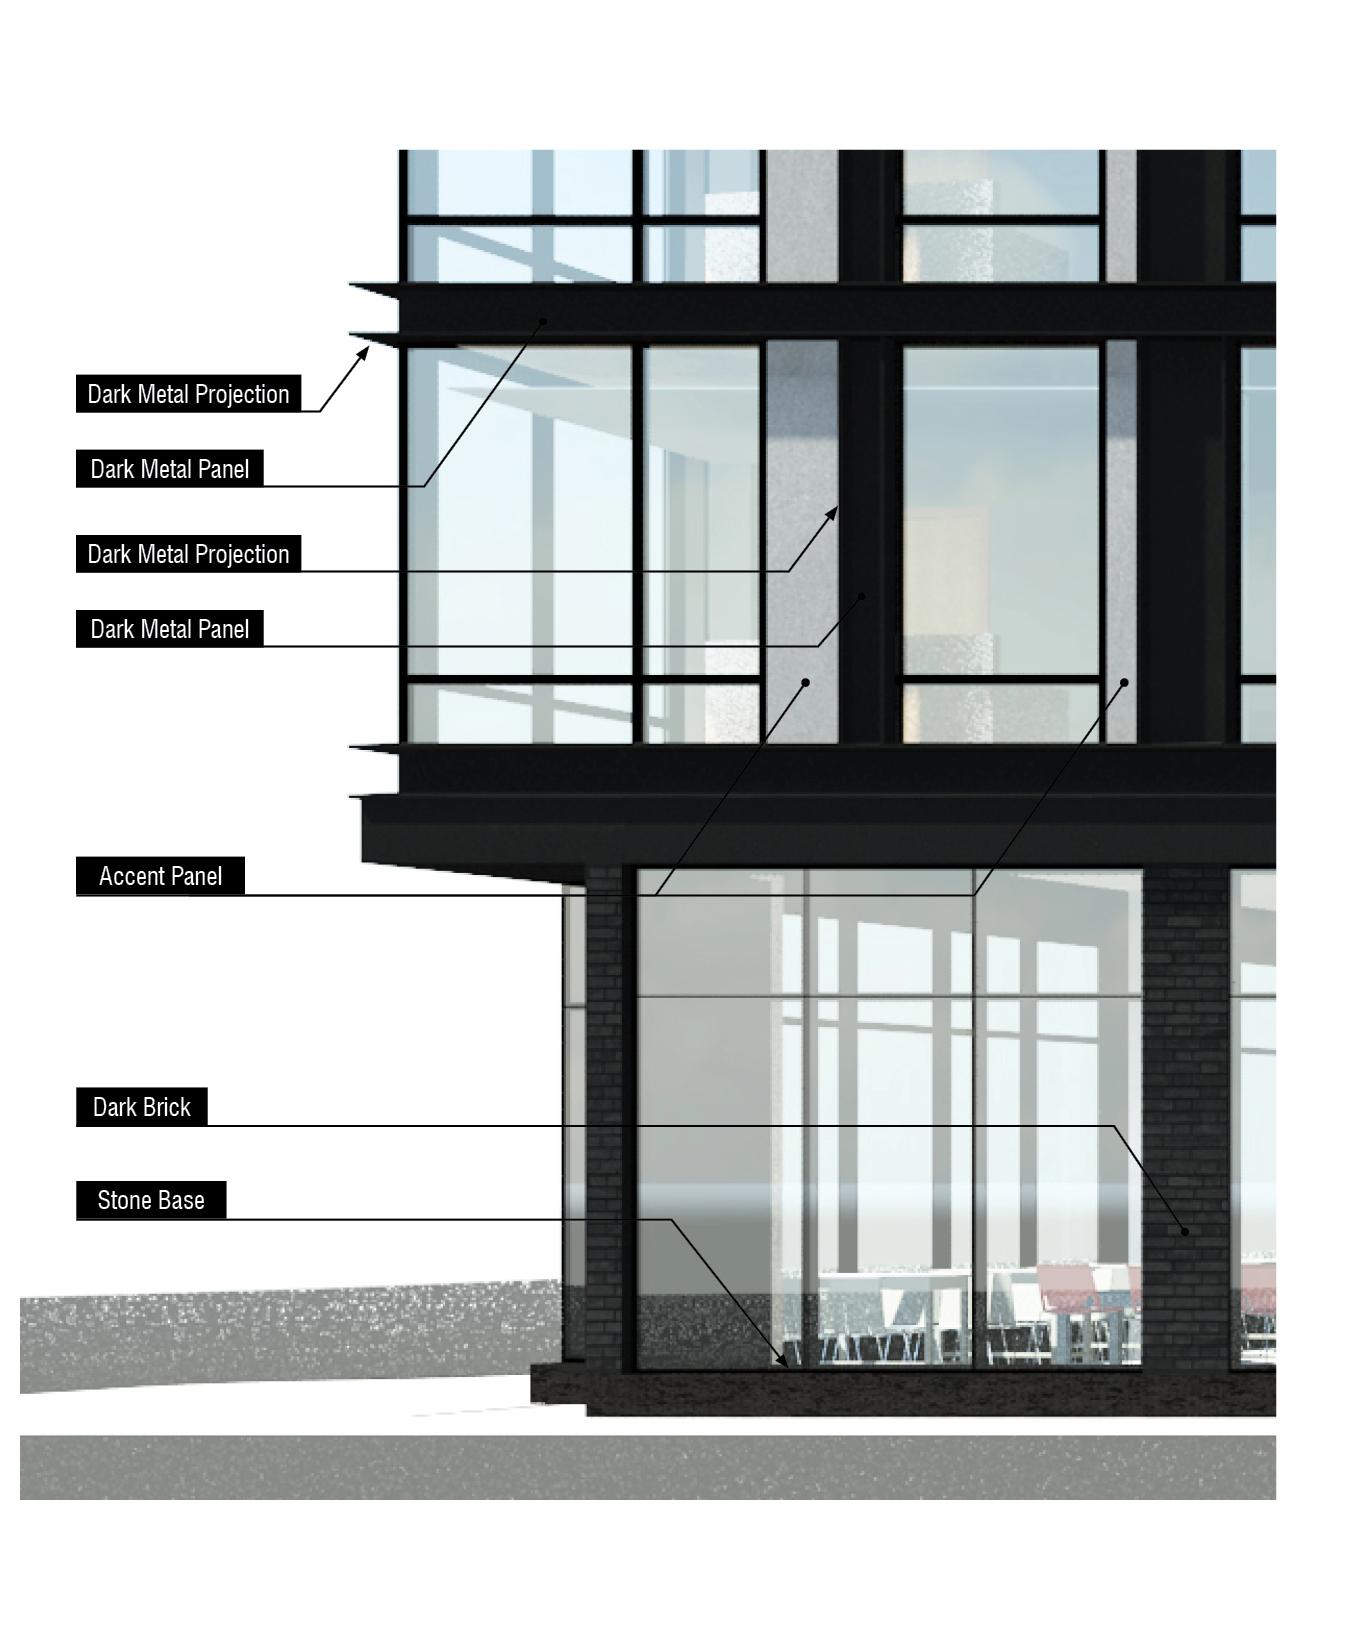 2014_10_02_136065_P03_Concept-Presentation_11x1721B.jpg